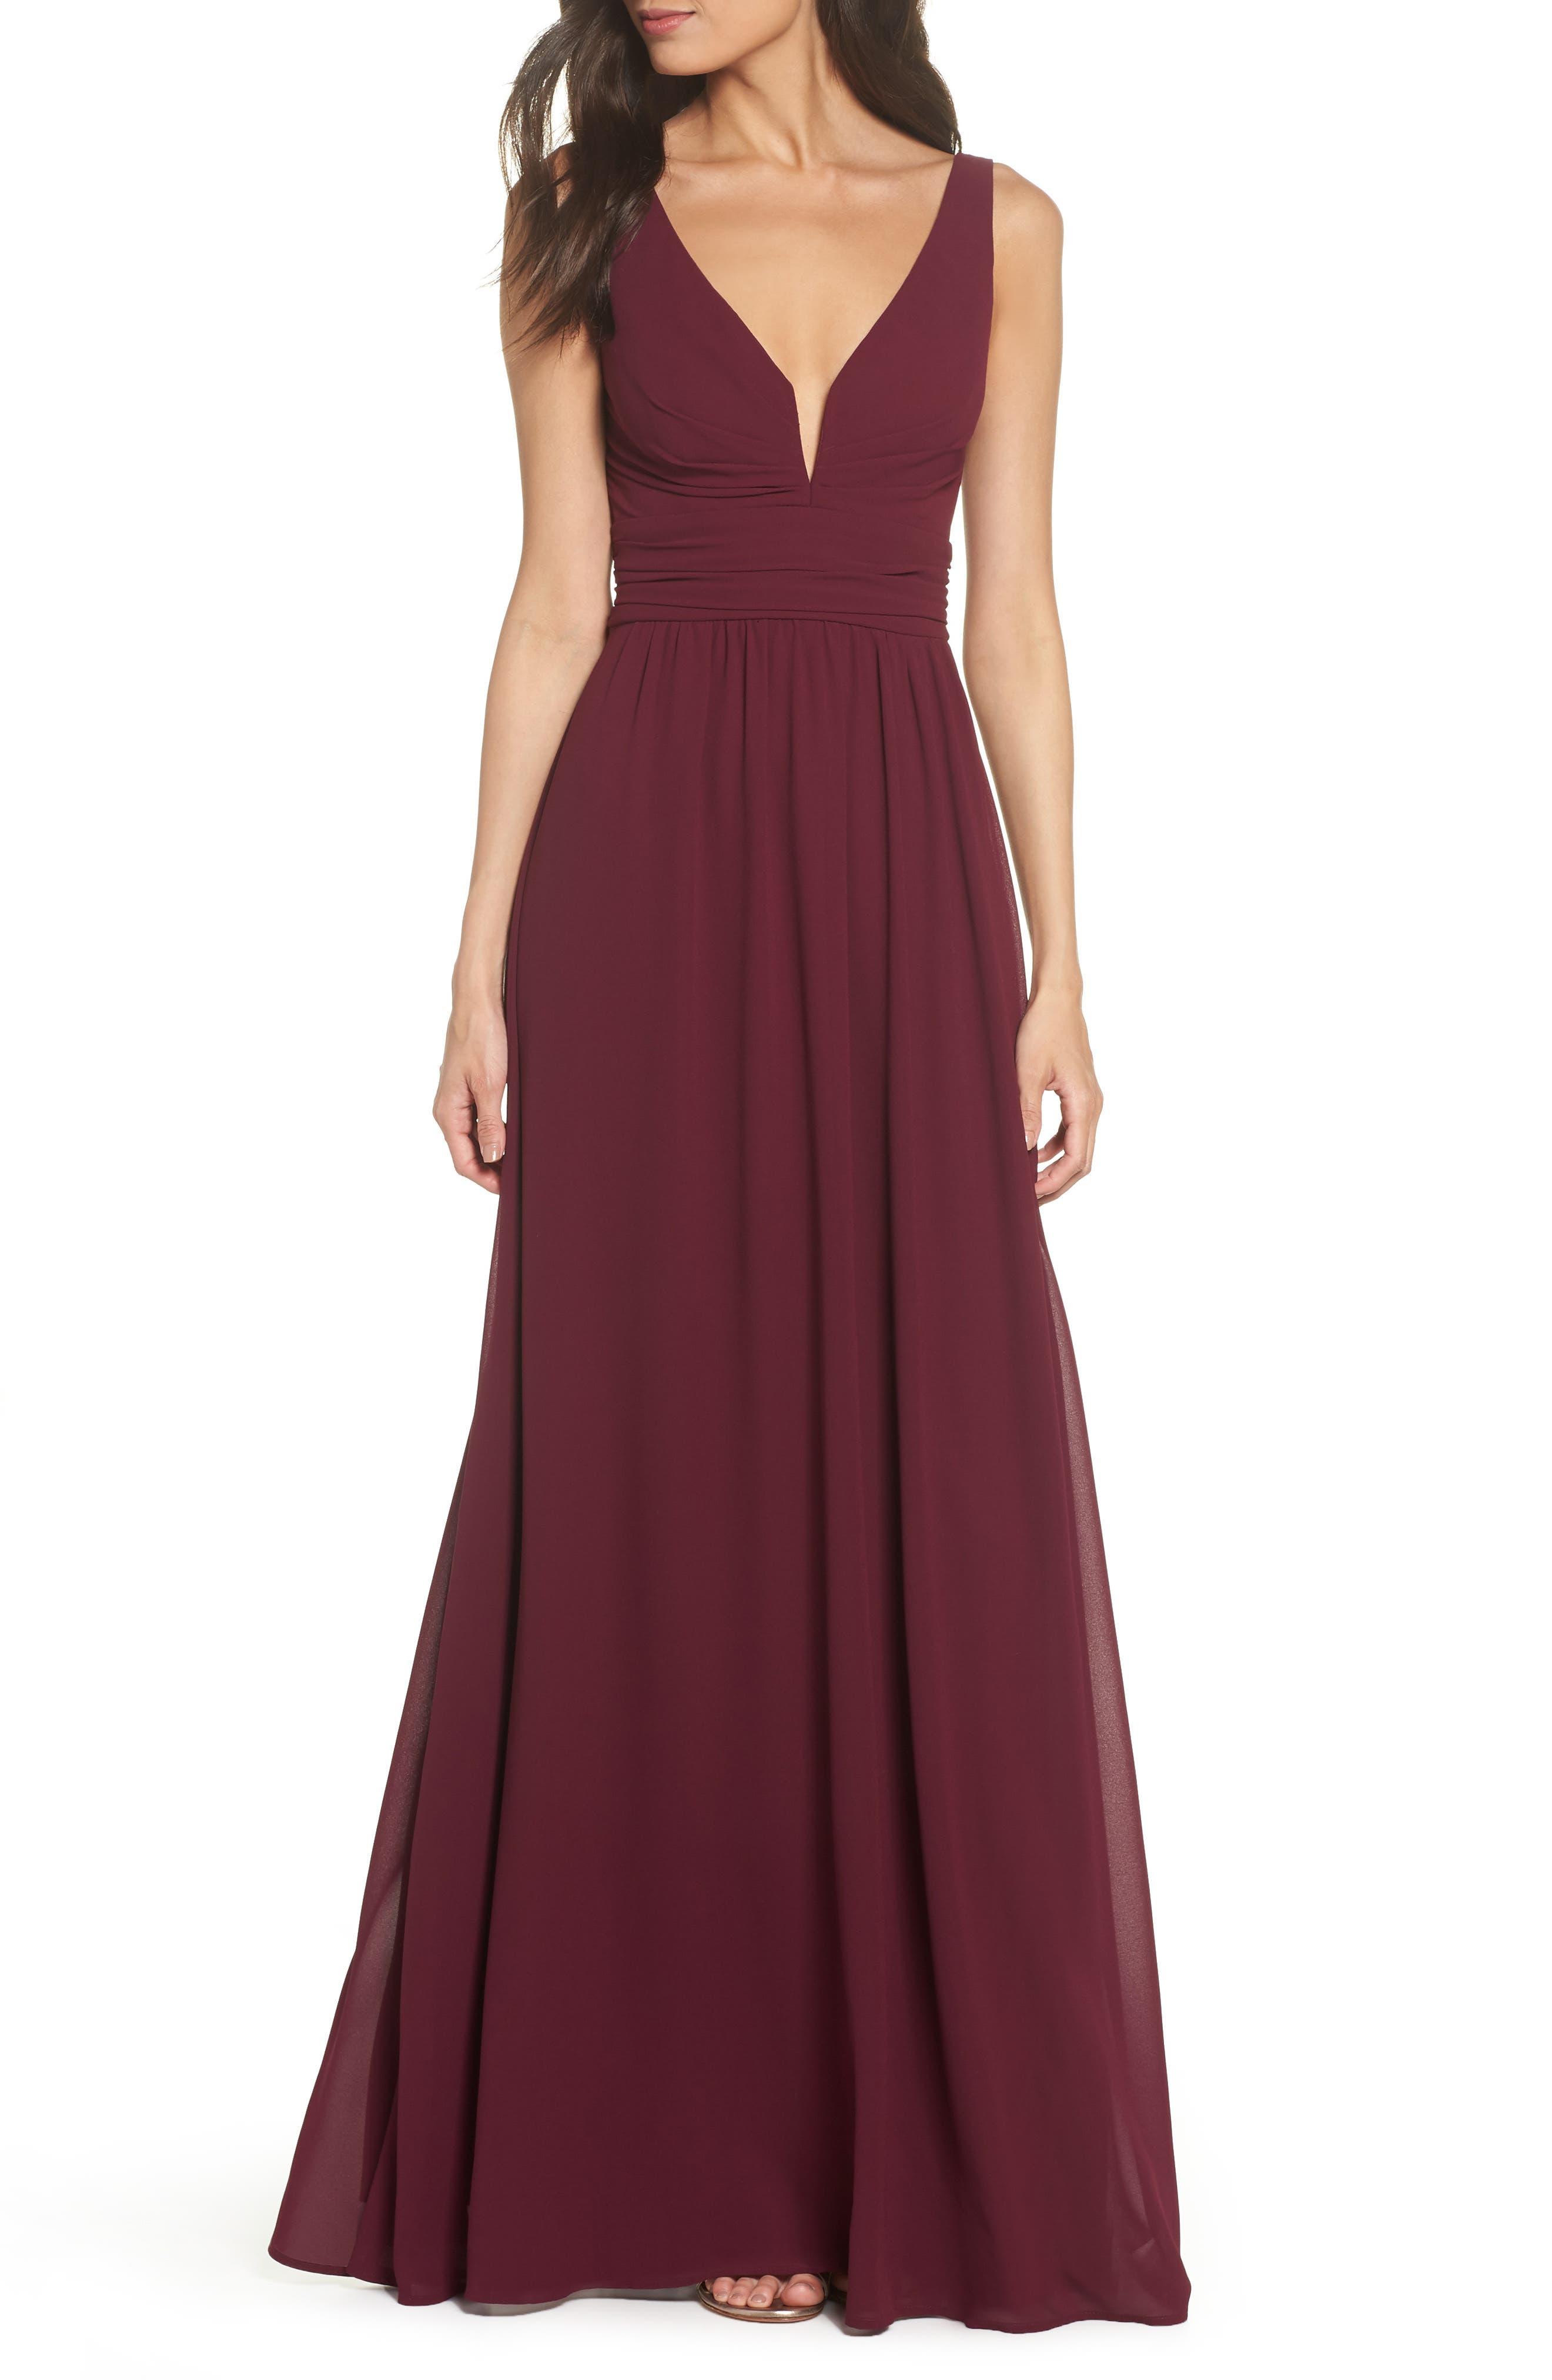 Women's Bridesmaid Dresses | Nordstrom